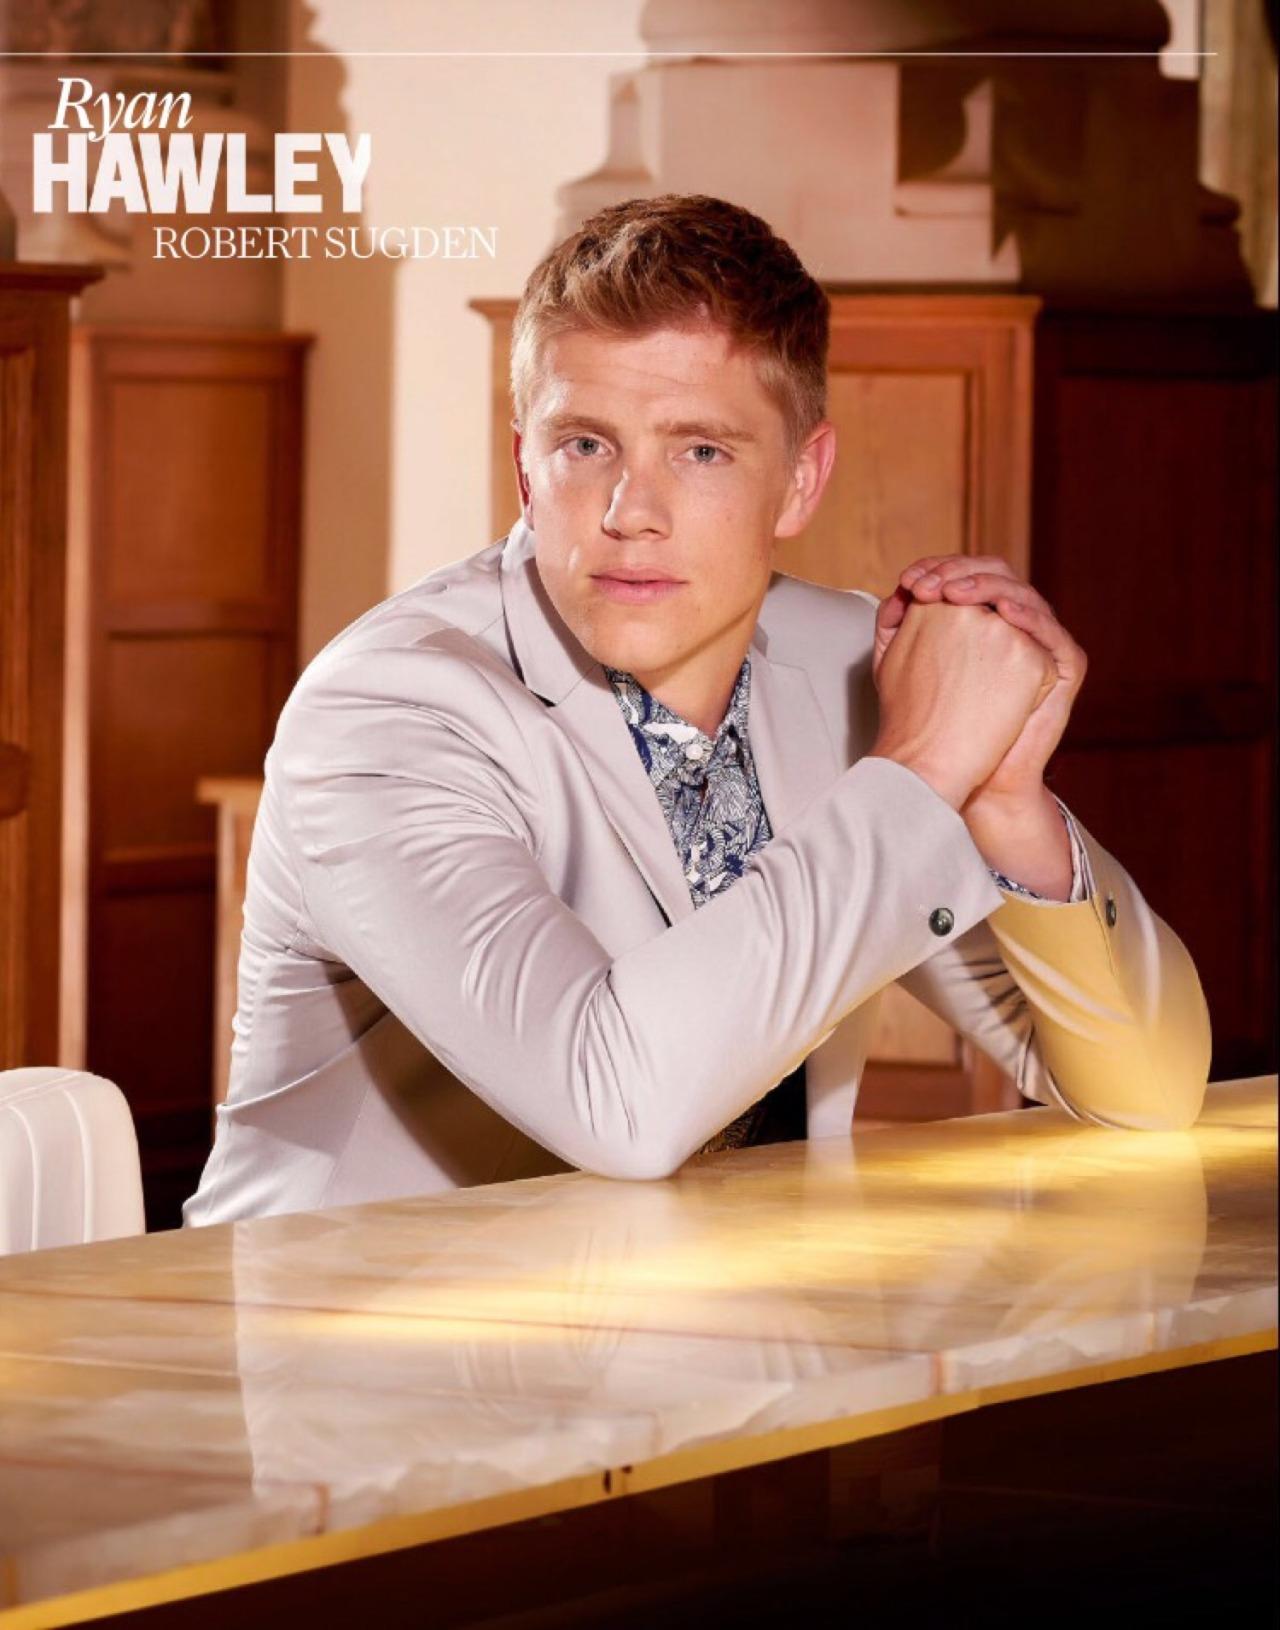 Ryan hawley hawley robert interview summer robert sugden inside soap